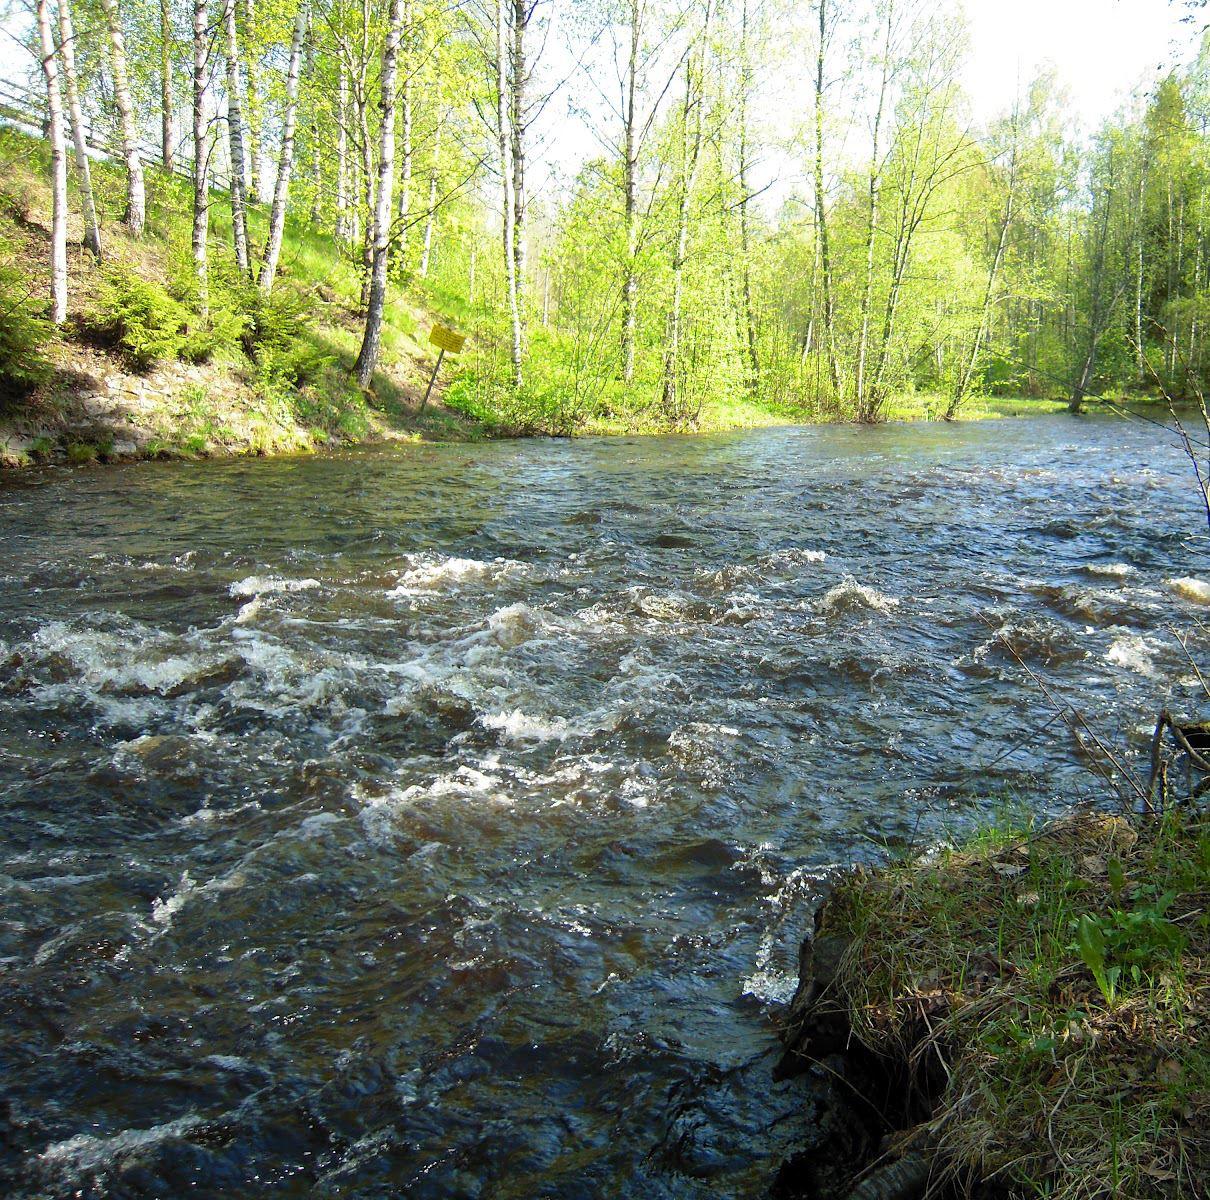 River Teuronjoki